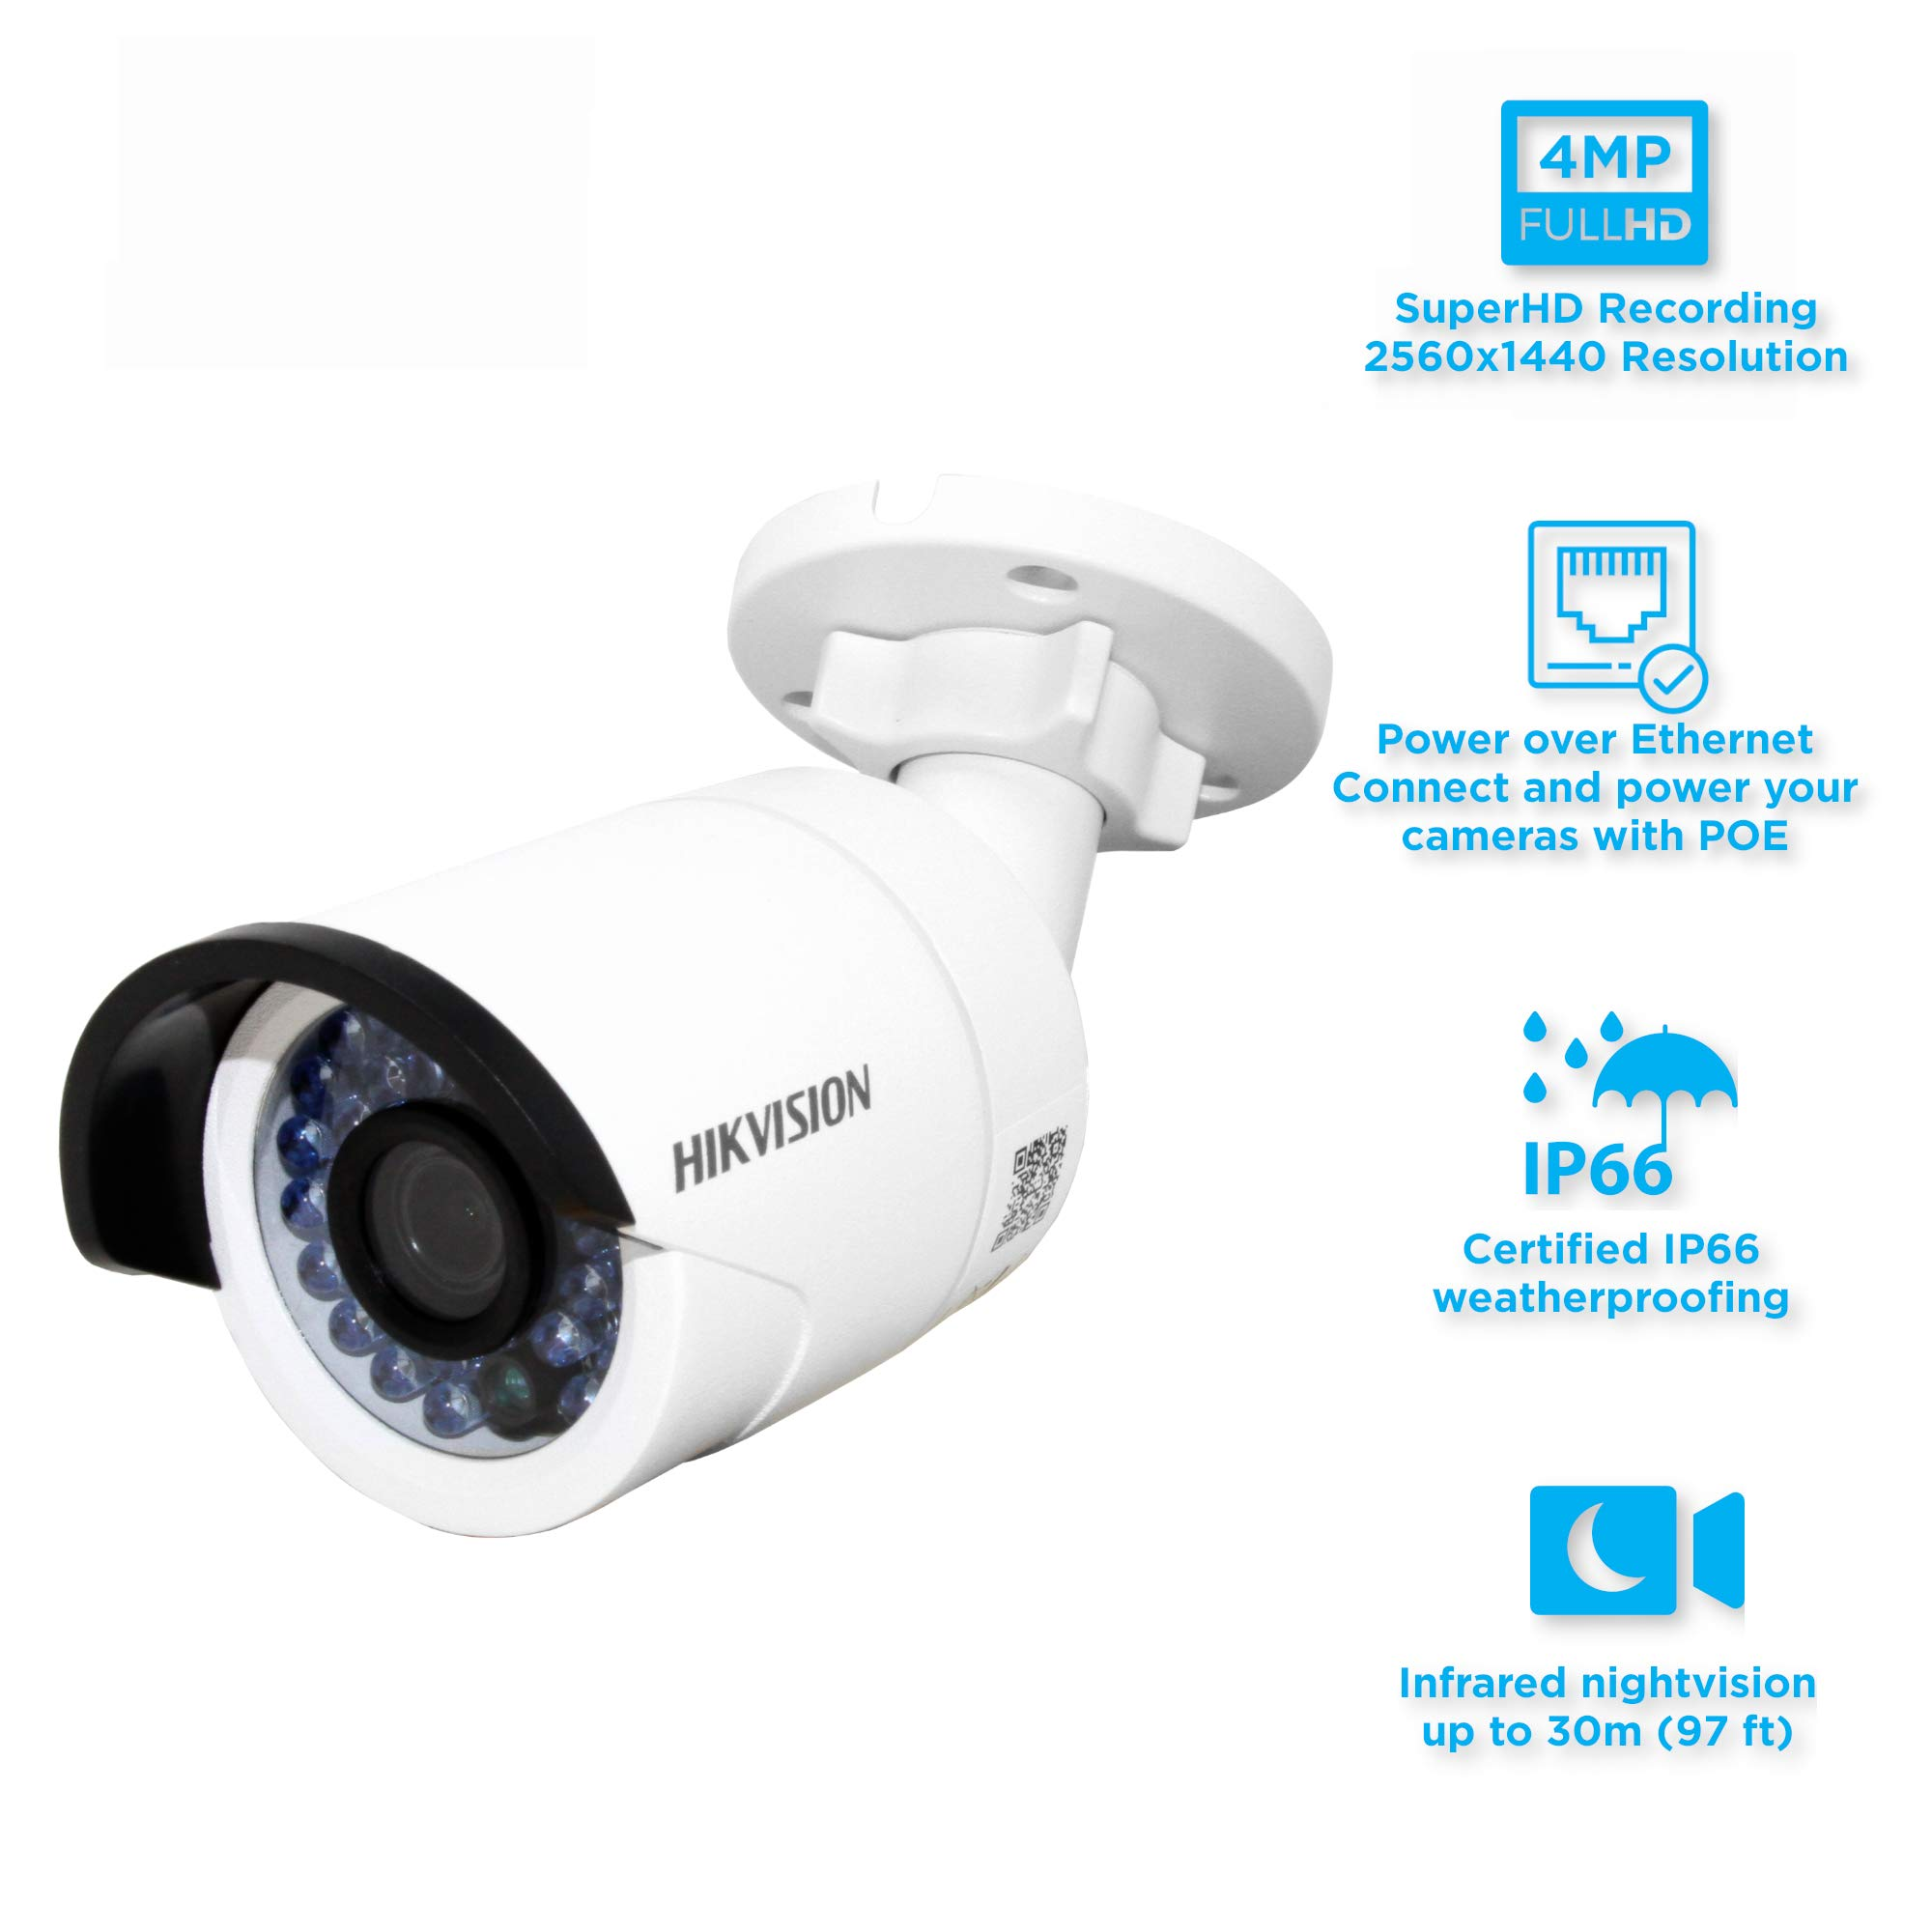 HIKVISION 4MP IP Camera DS-2CD2042WD-I Full HD 4MP IP Camera High Resoultion WDR POE Bullet CCTV Camera